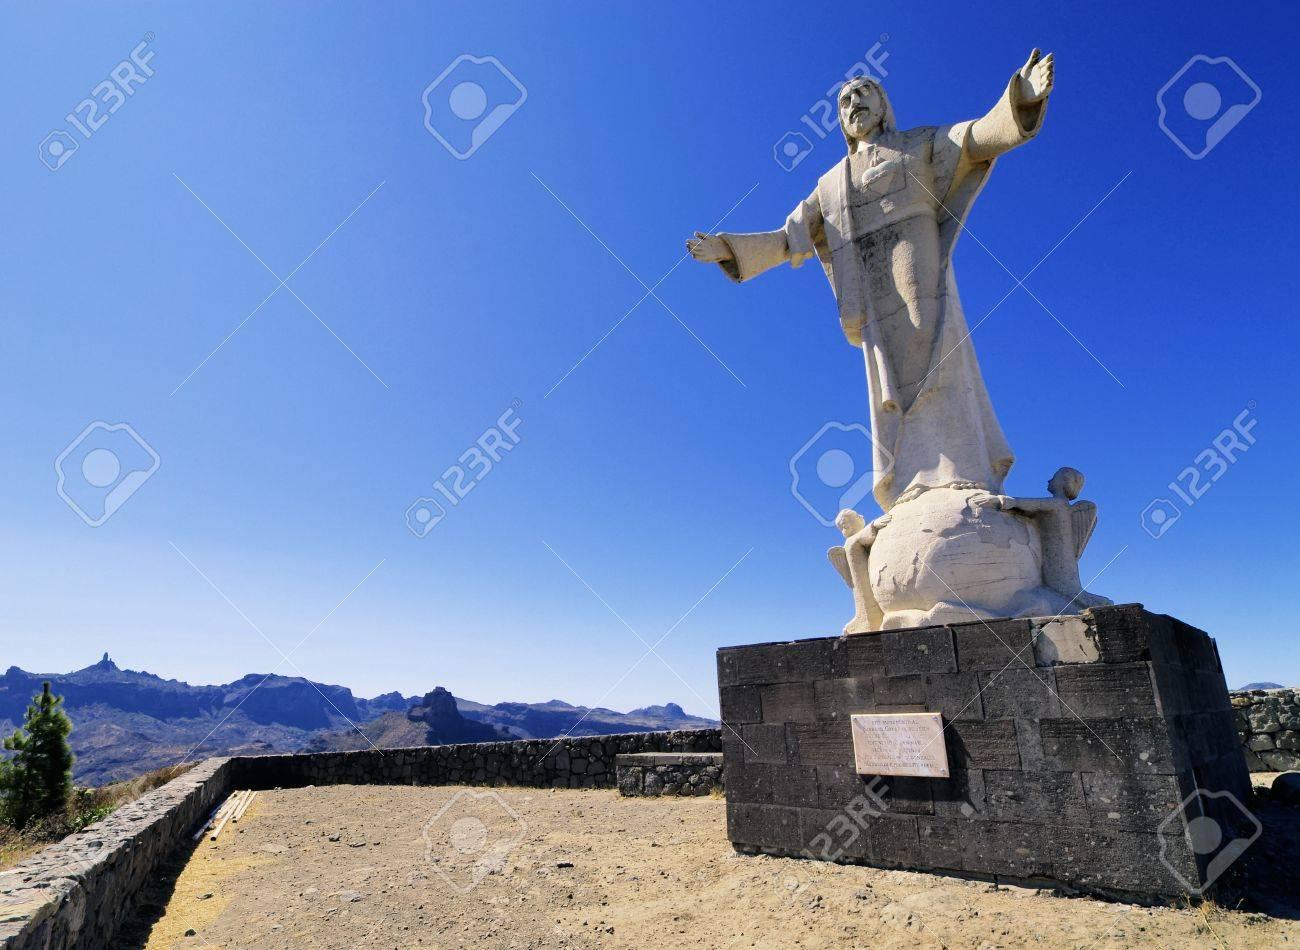 Artenara, Gran Canaria, Canary Islands, Spain Stock Photo - 15309128